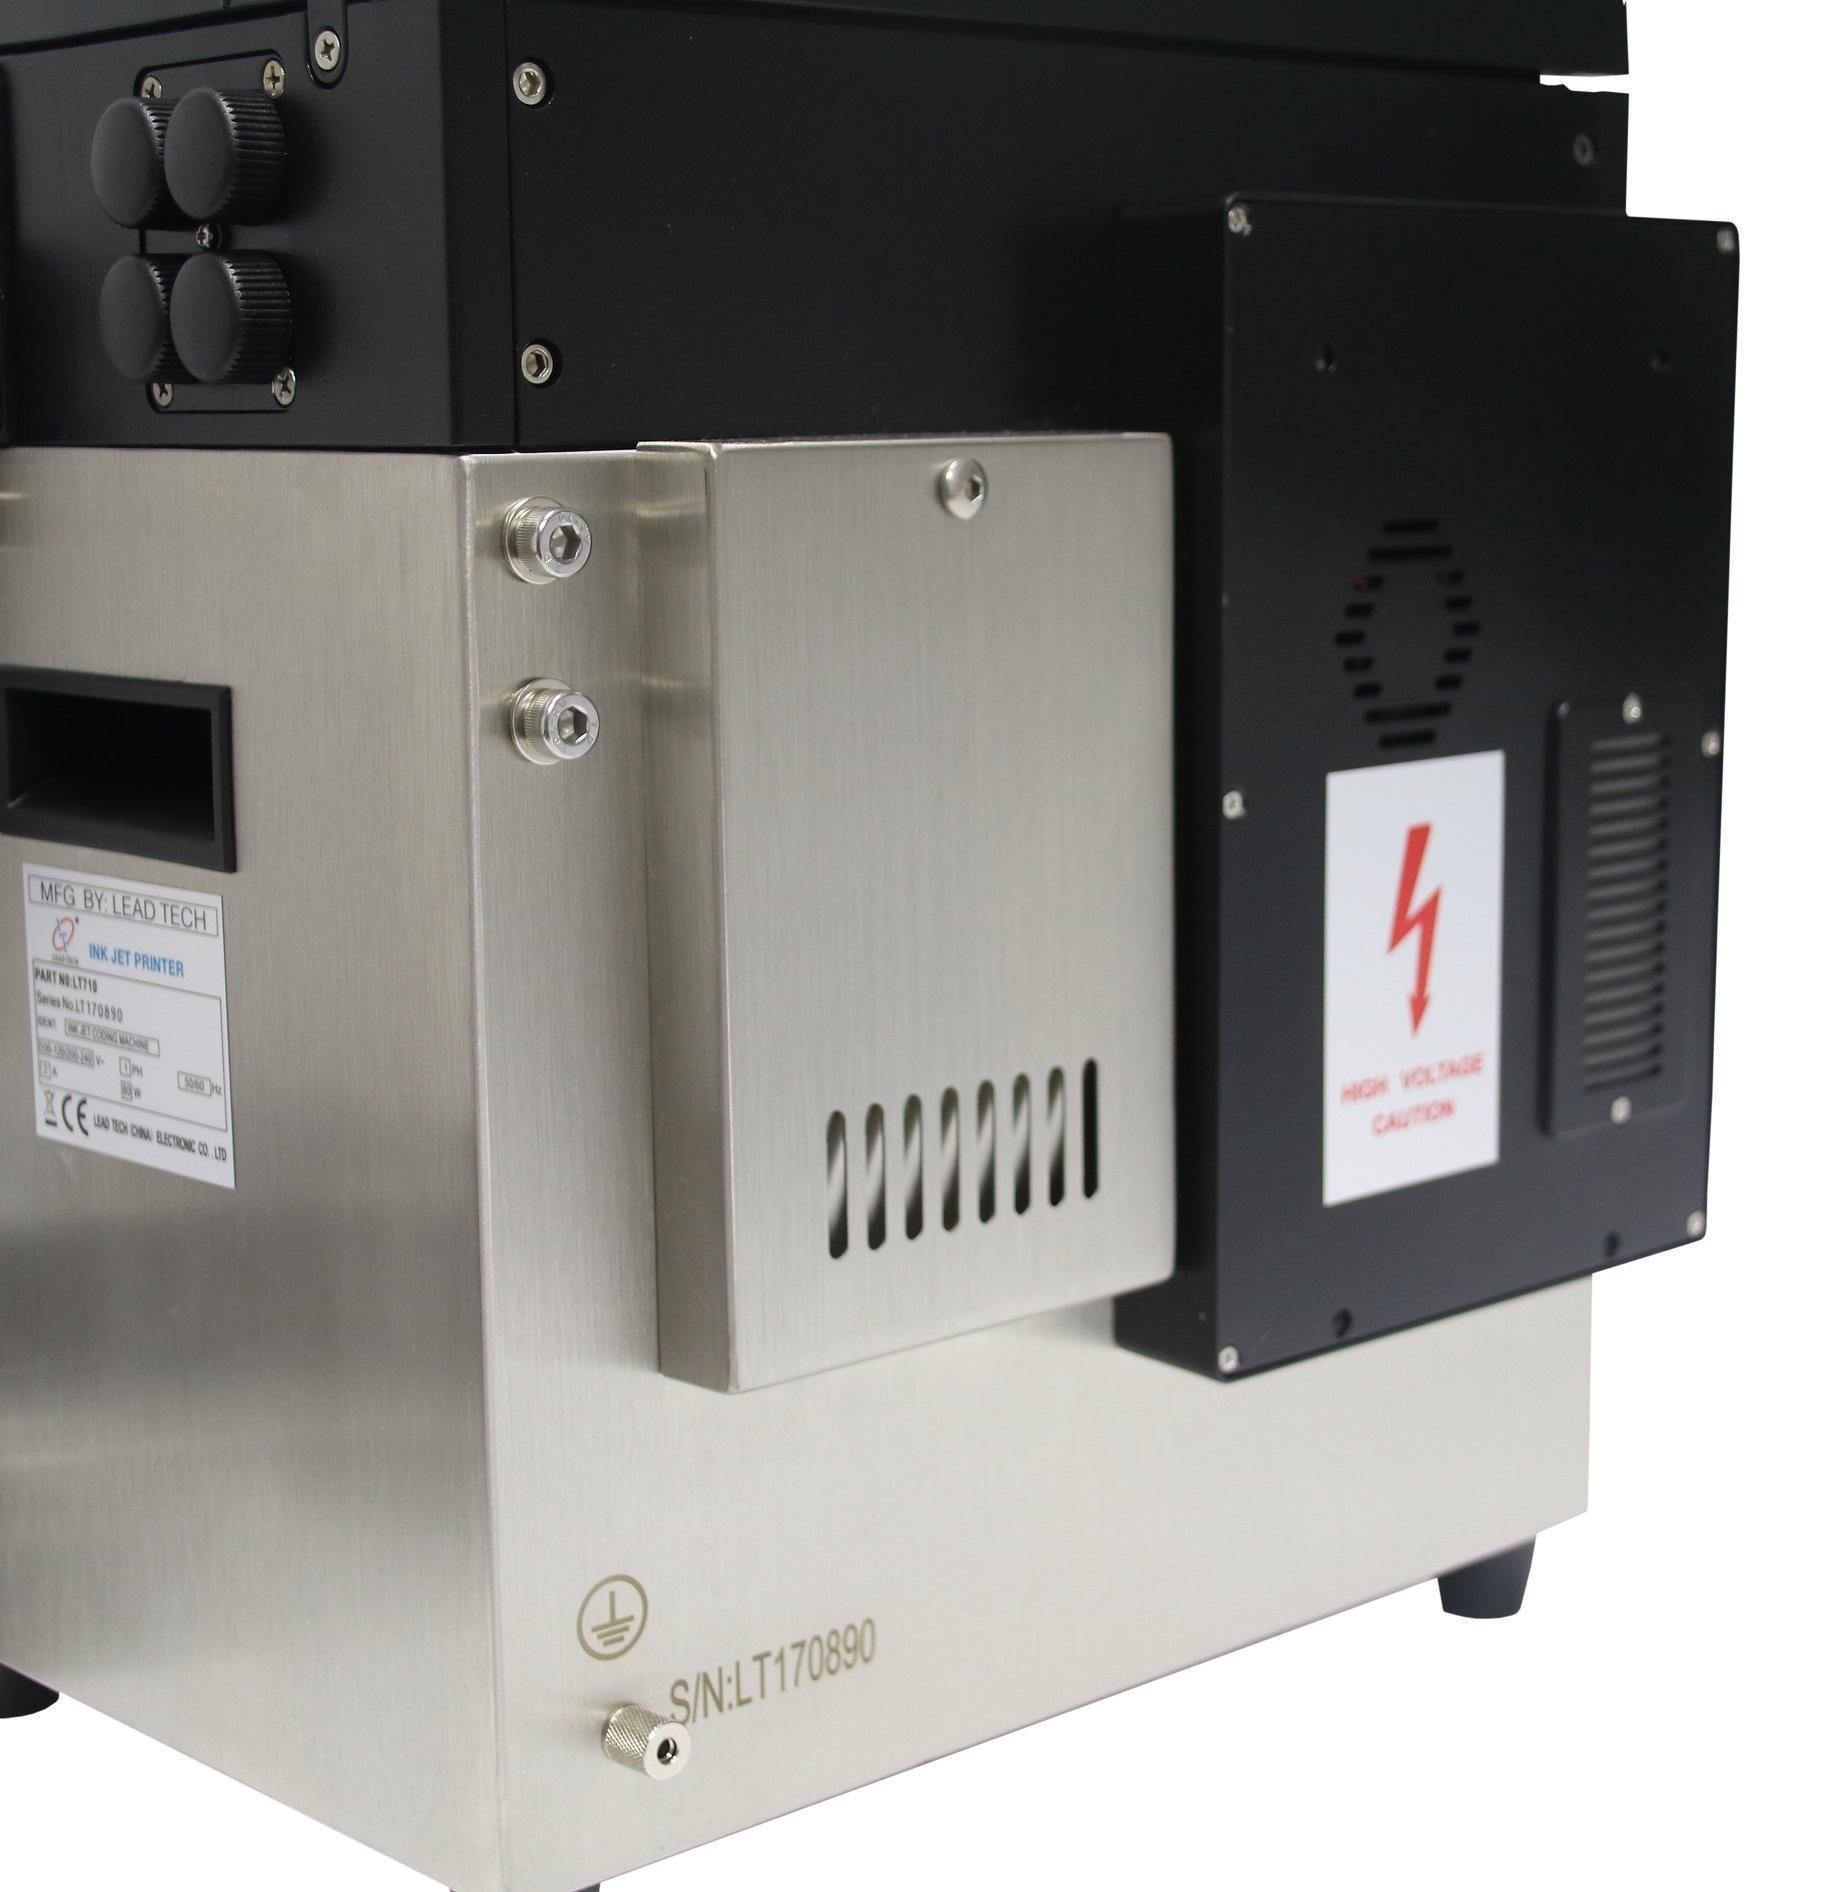 Lead Tech Lt760 Small Characters PVC Pipe Printing Inkjet Printer